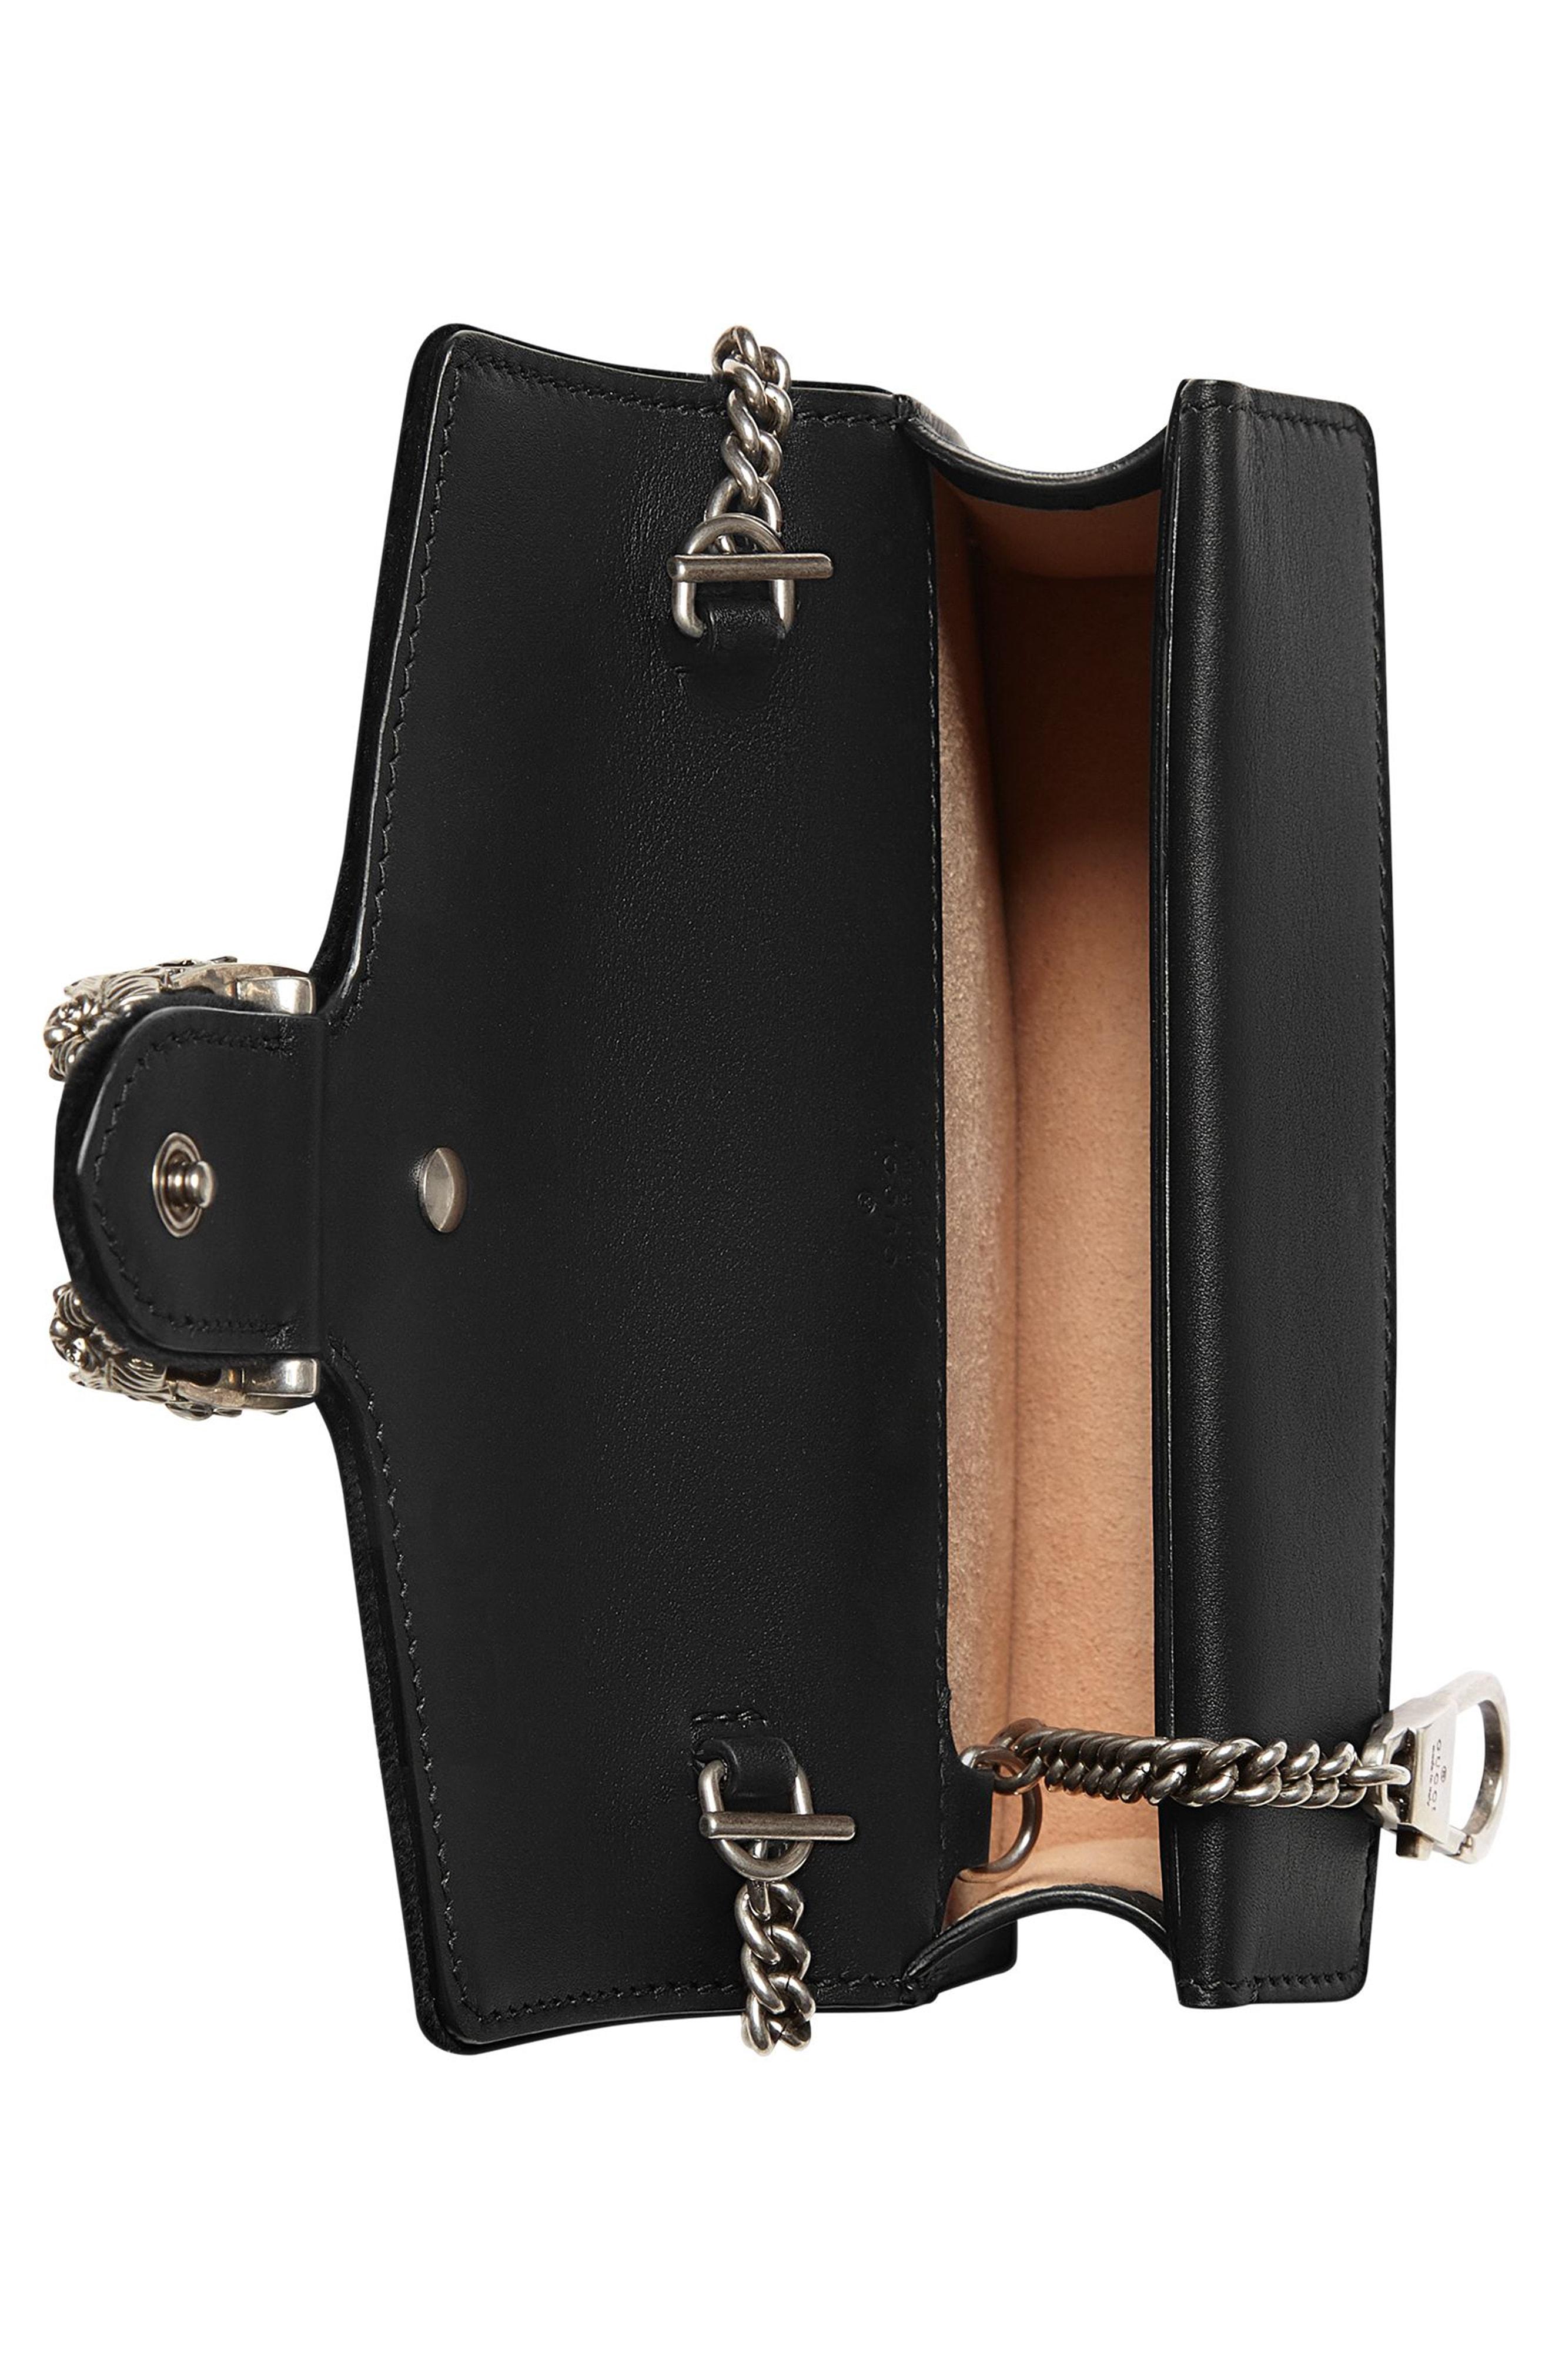 e859a4451b4 Gucci Super Mini Dionysus Leather Shoulder Bag - Black